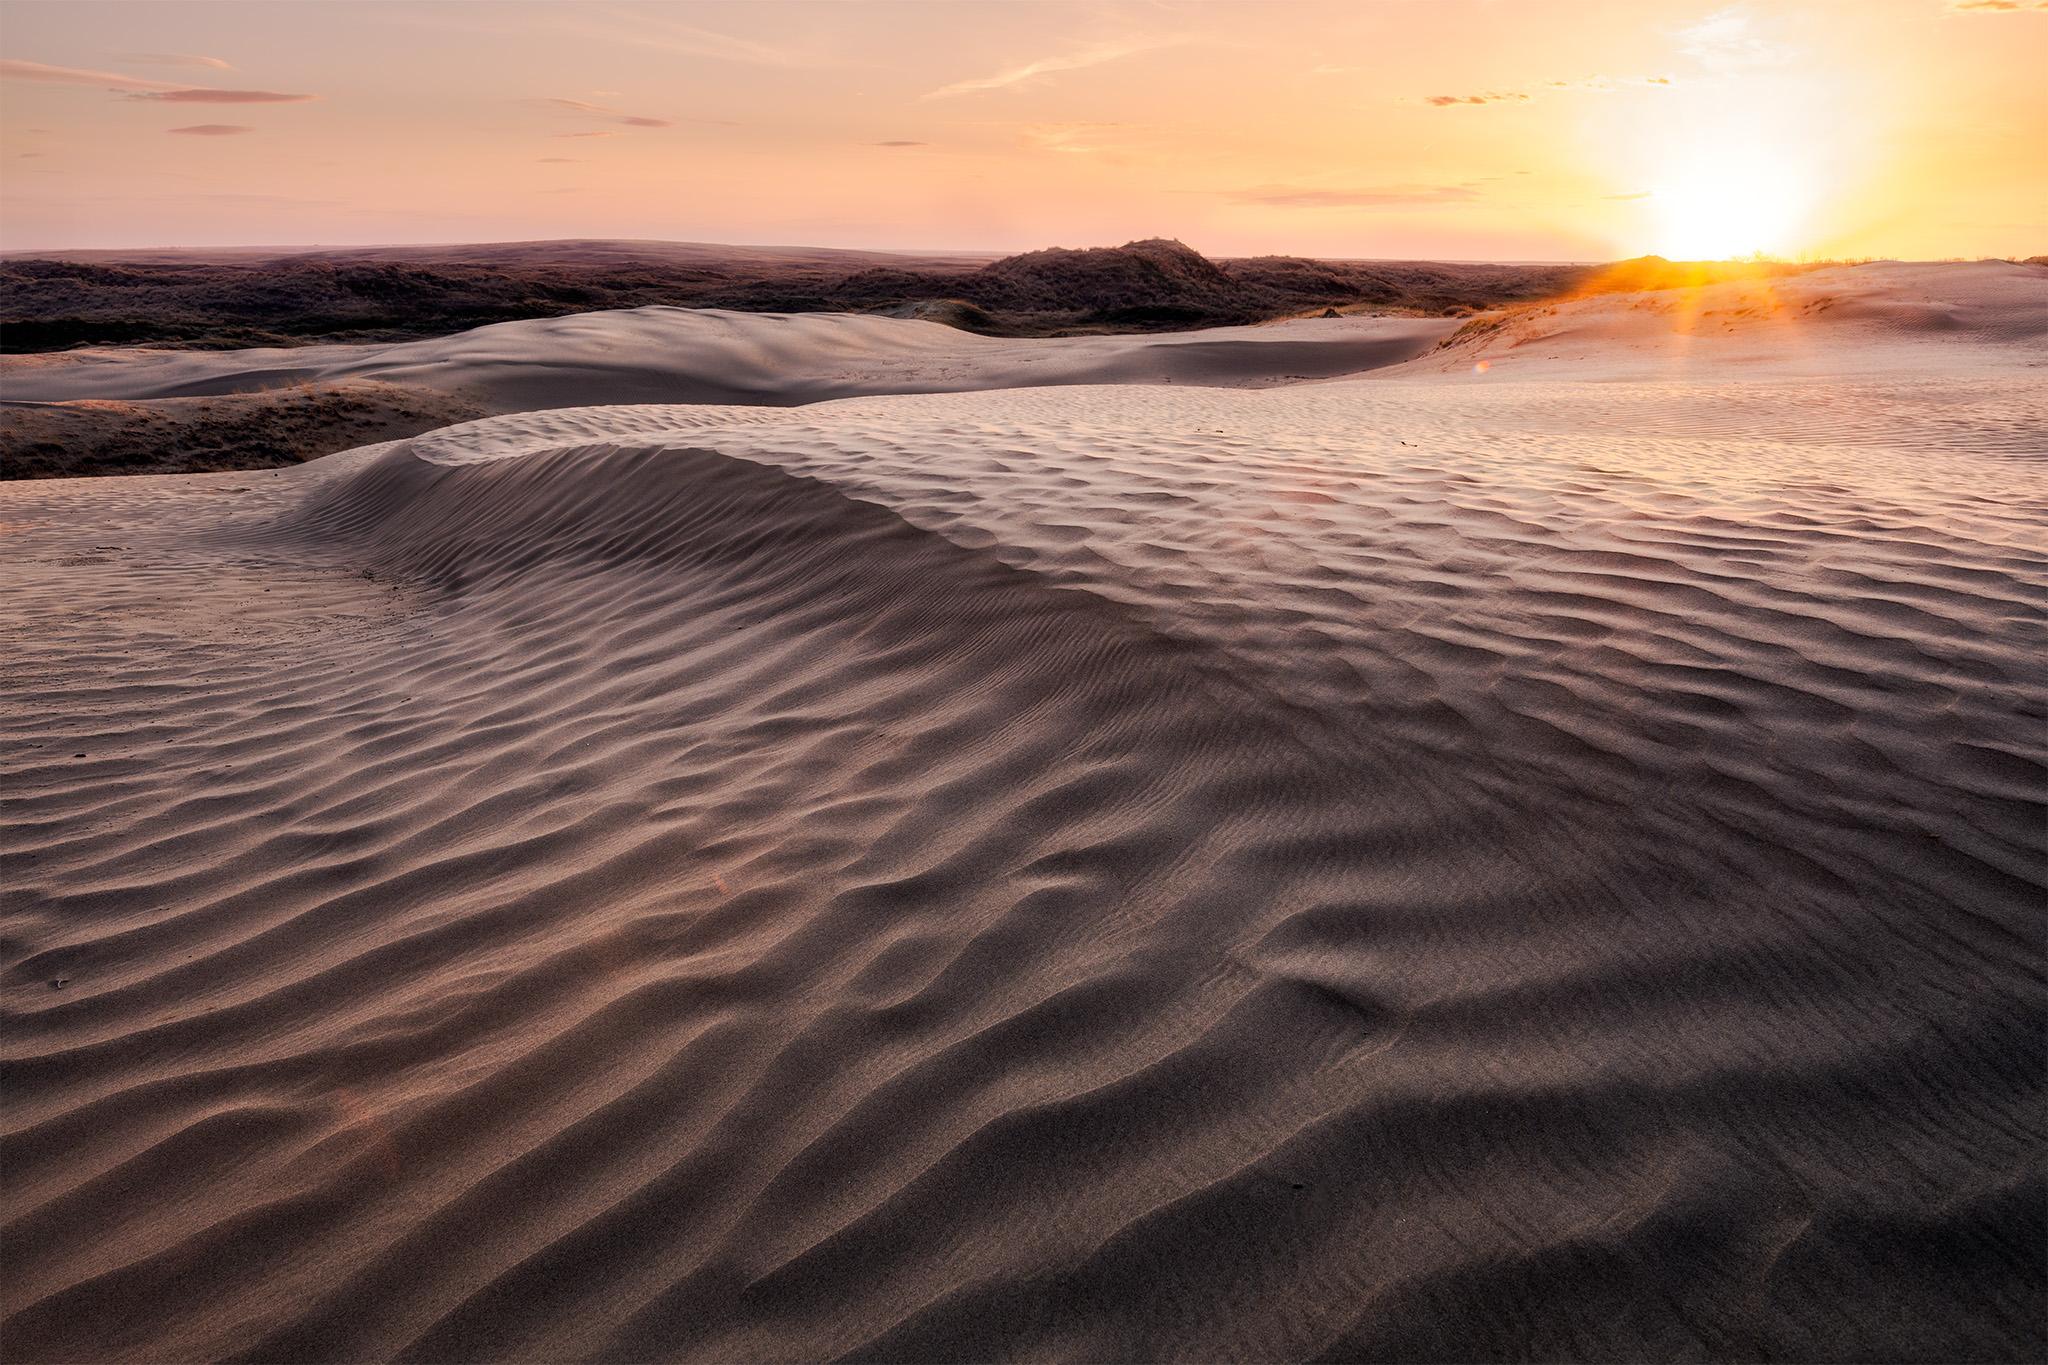 The sun sets on the landscape at the Great Sandhills, Saskatchewan.